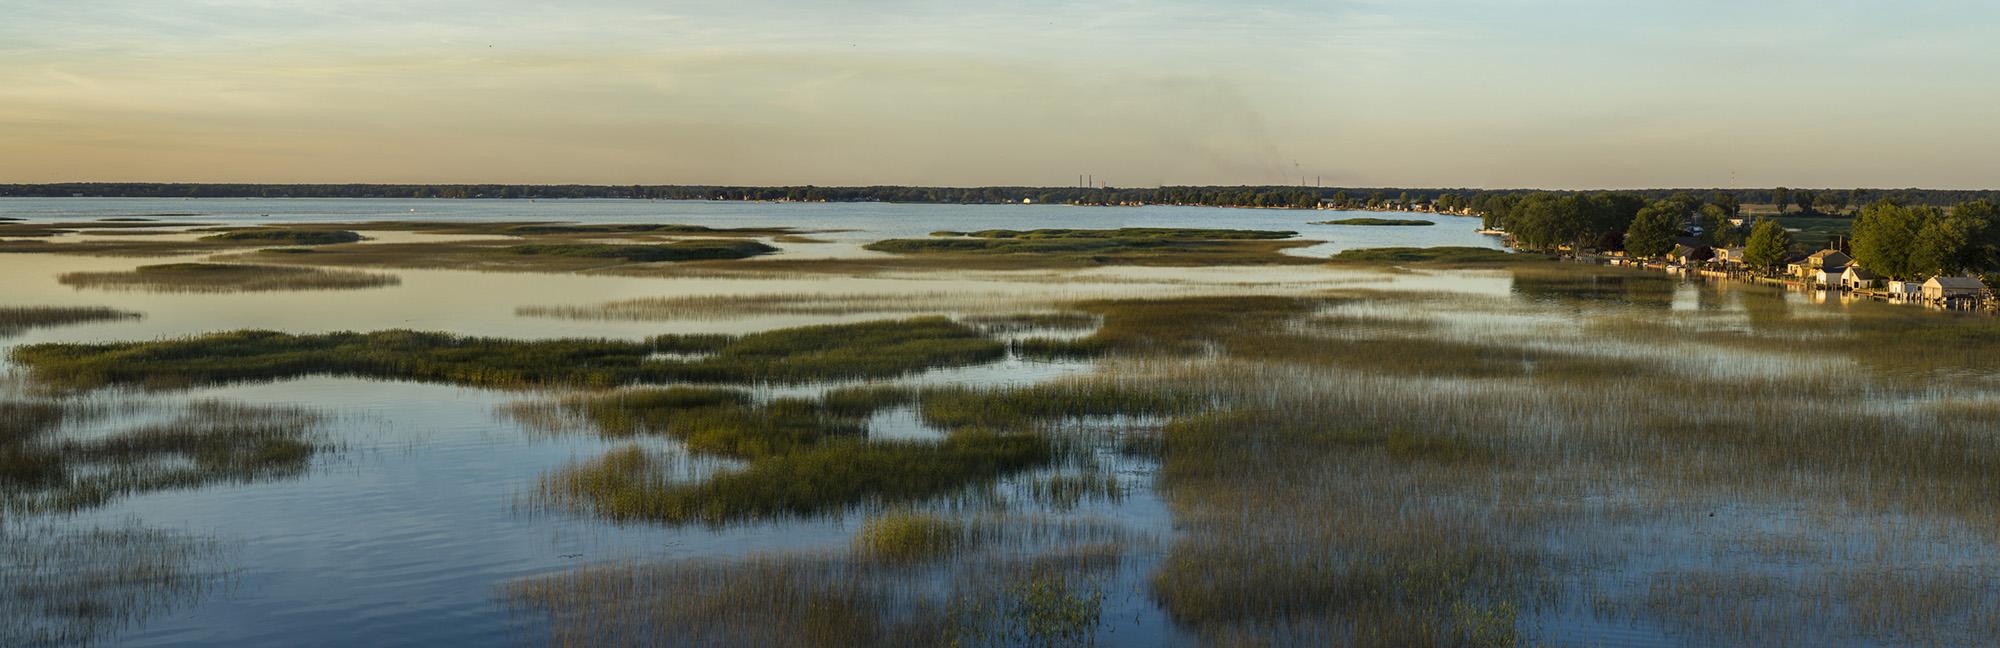 007_Peter_Essick-St._Clair_River_Estuary_Michigan.jpg